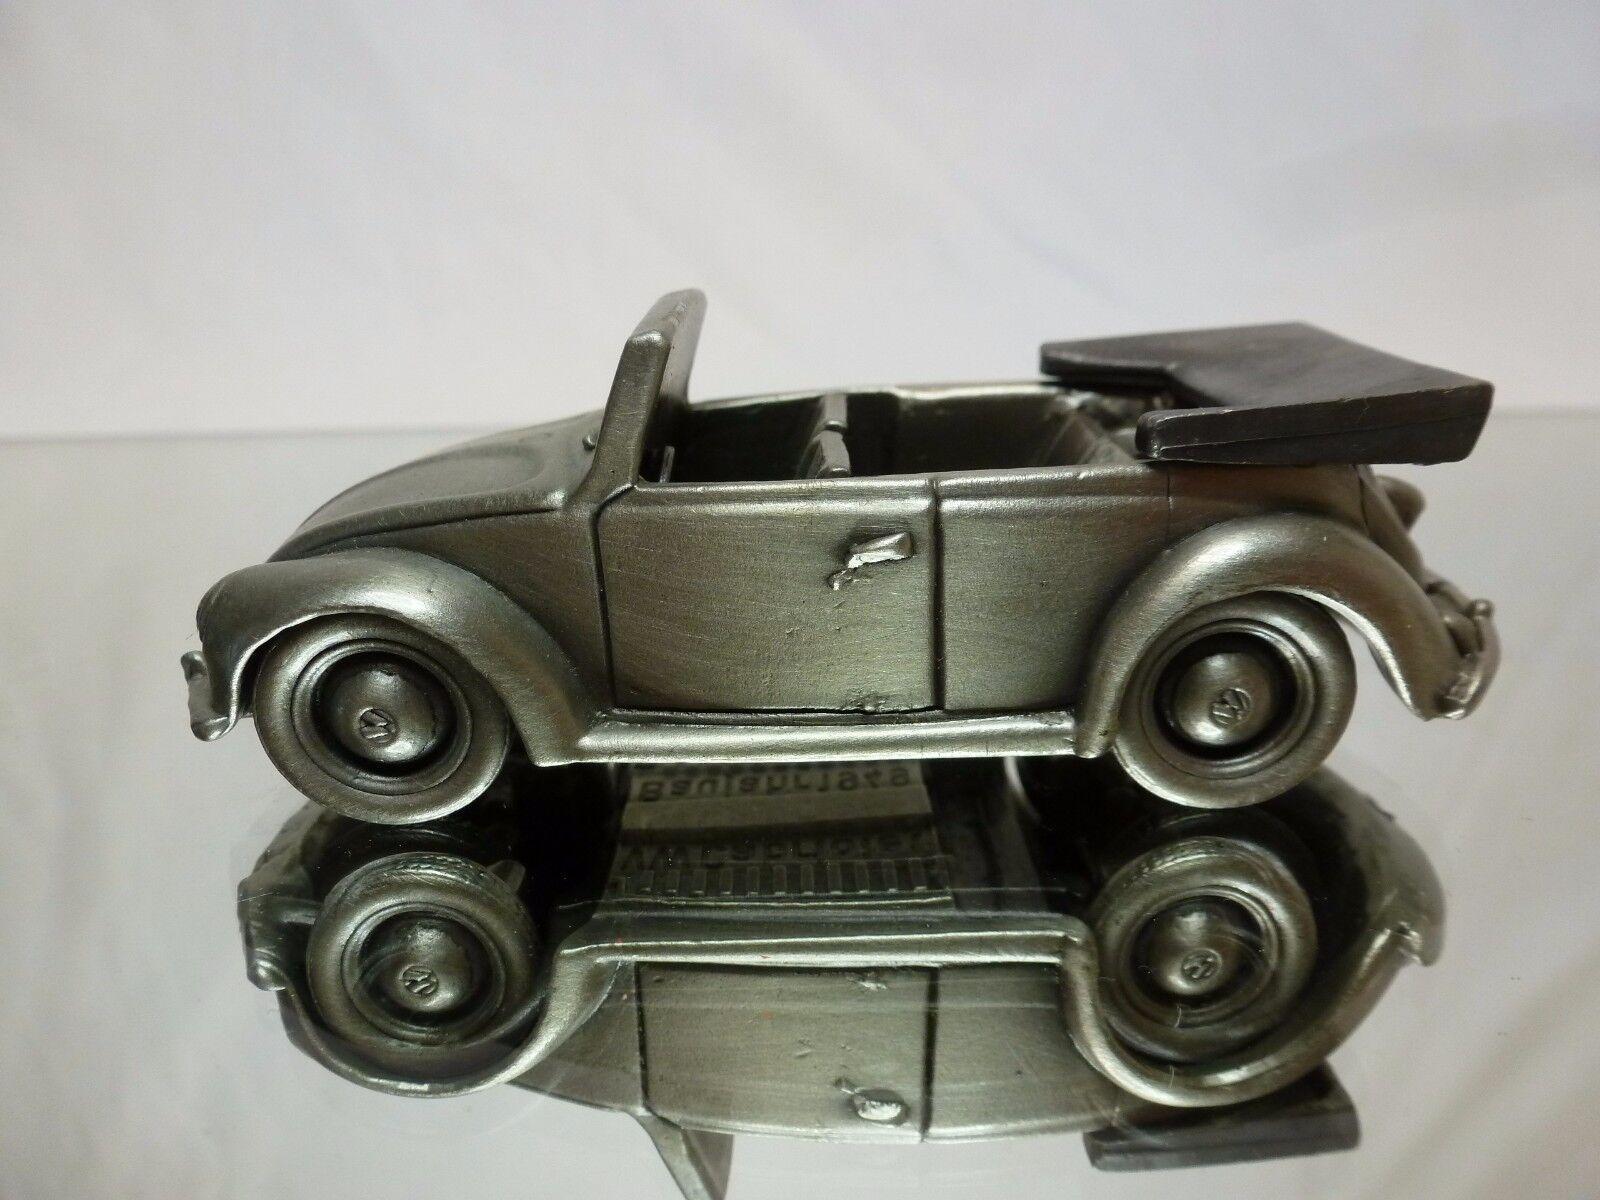 TIN METAL GERMANY VW VOLKSWAGEN BEETLE CABRIOLET CABRIOLET CABRIOLET 1949 - 1 43 - GOOD CONDITION 4b91e9